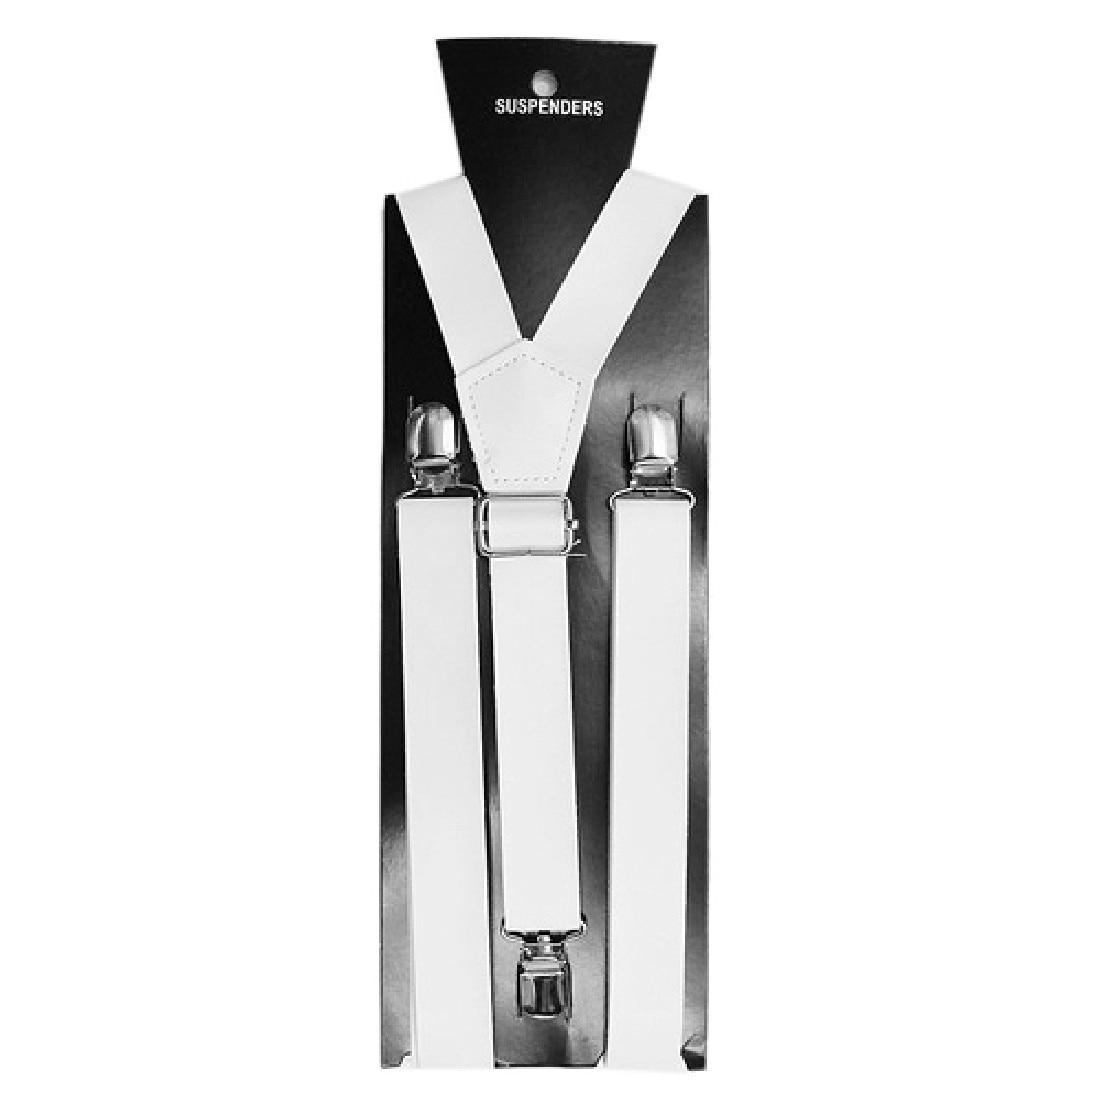 New Mens Womens Unisex Clip-on Suspenders Elastic Y-Shape Adjustable 2.5cm*100cm Strap Dress Accessories Strap Apparel 2018 Hot